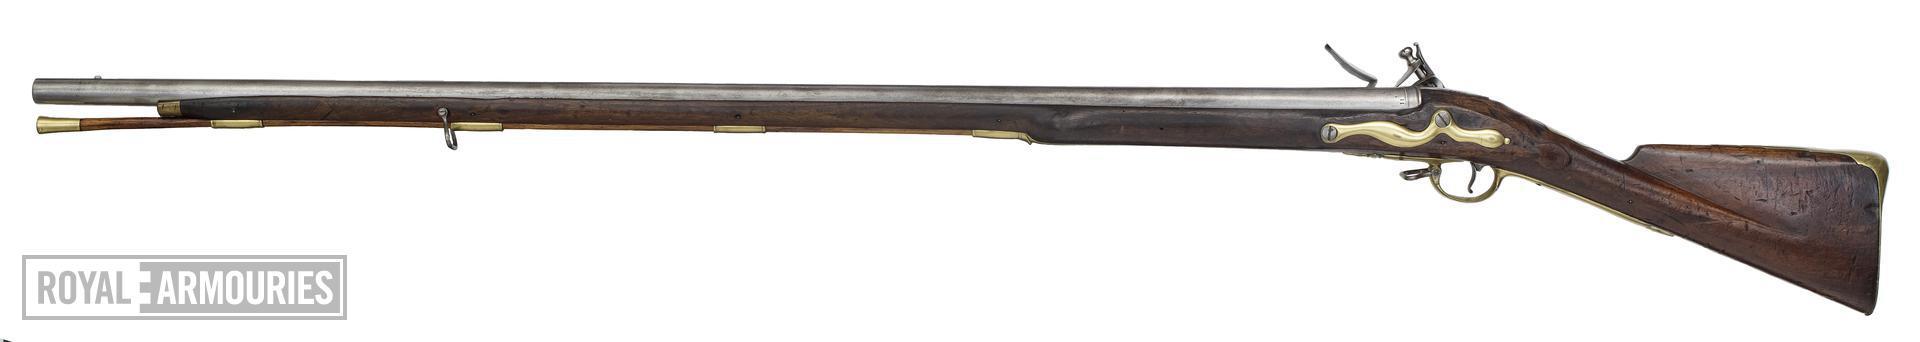 Flintlock muzzle-loading military musket - Long Land Pattern By I. Farmer